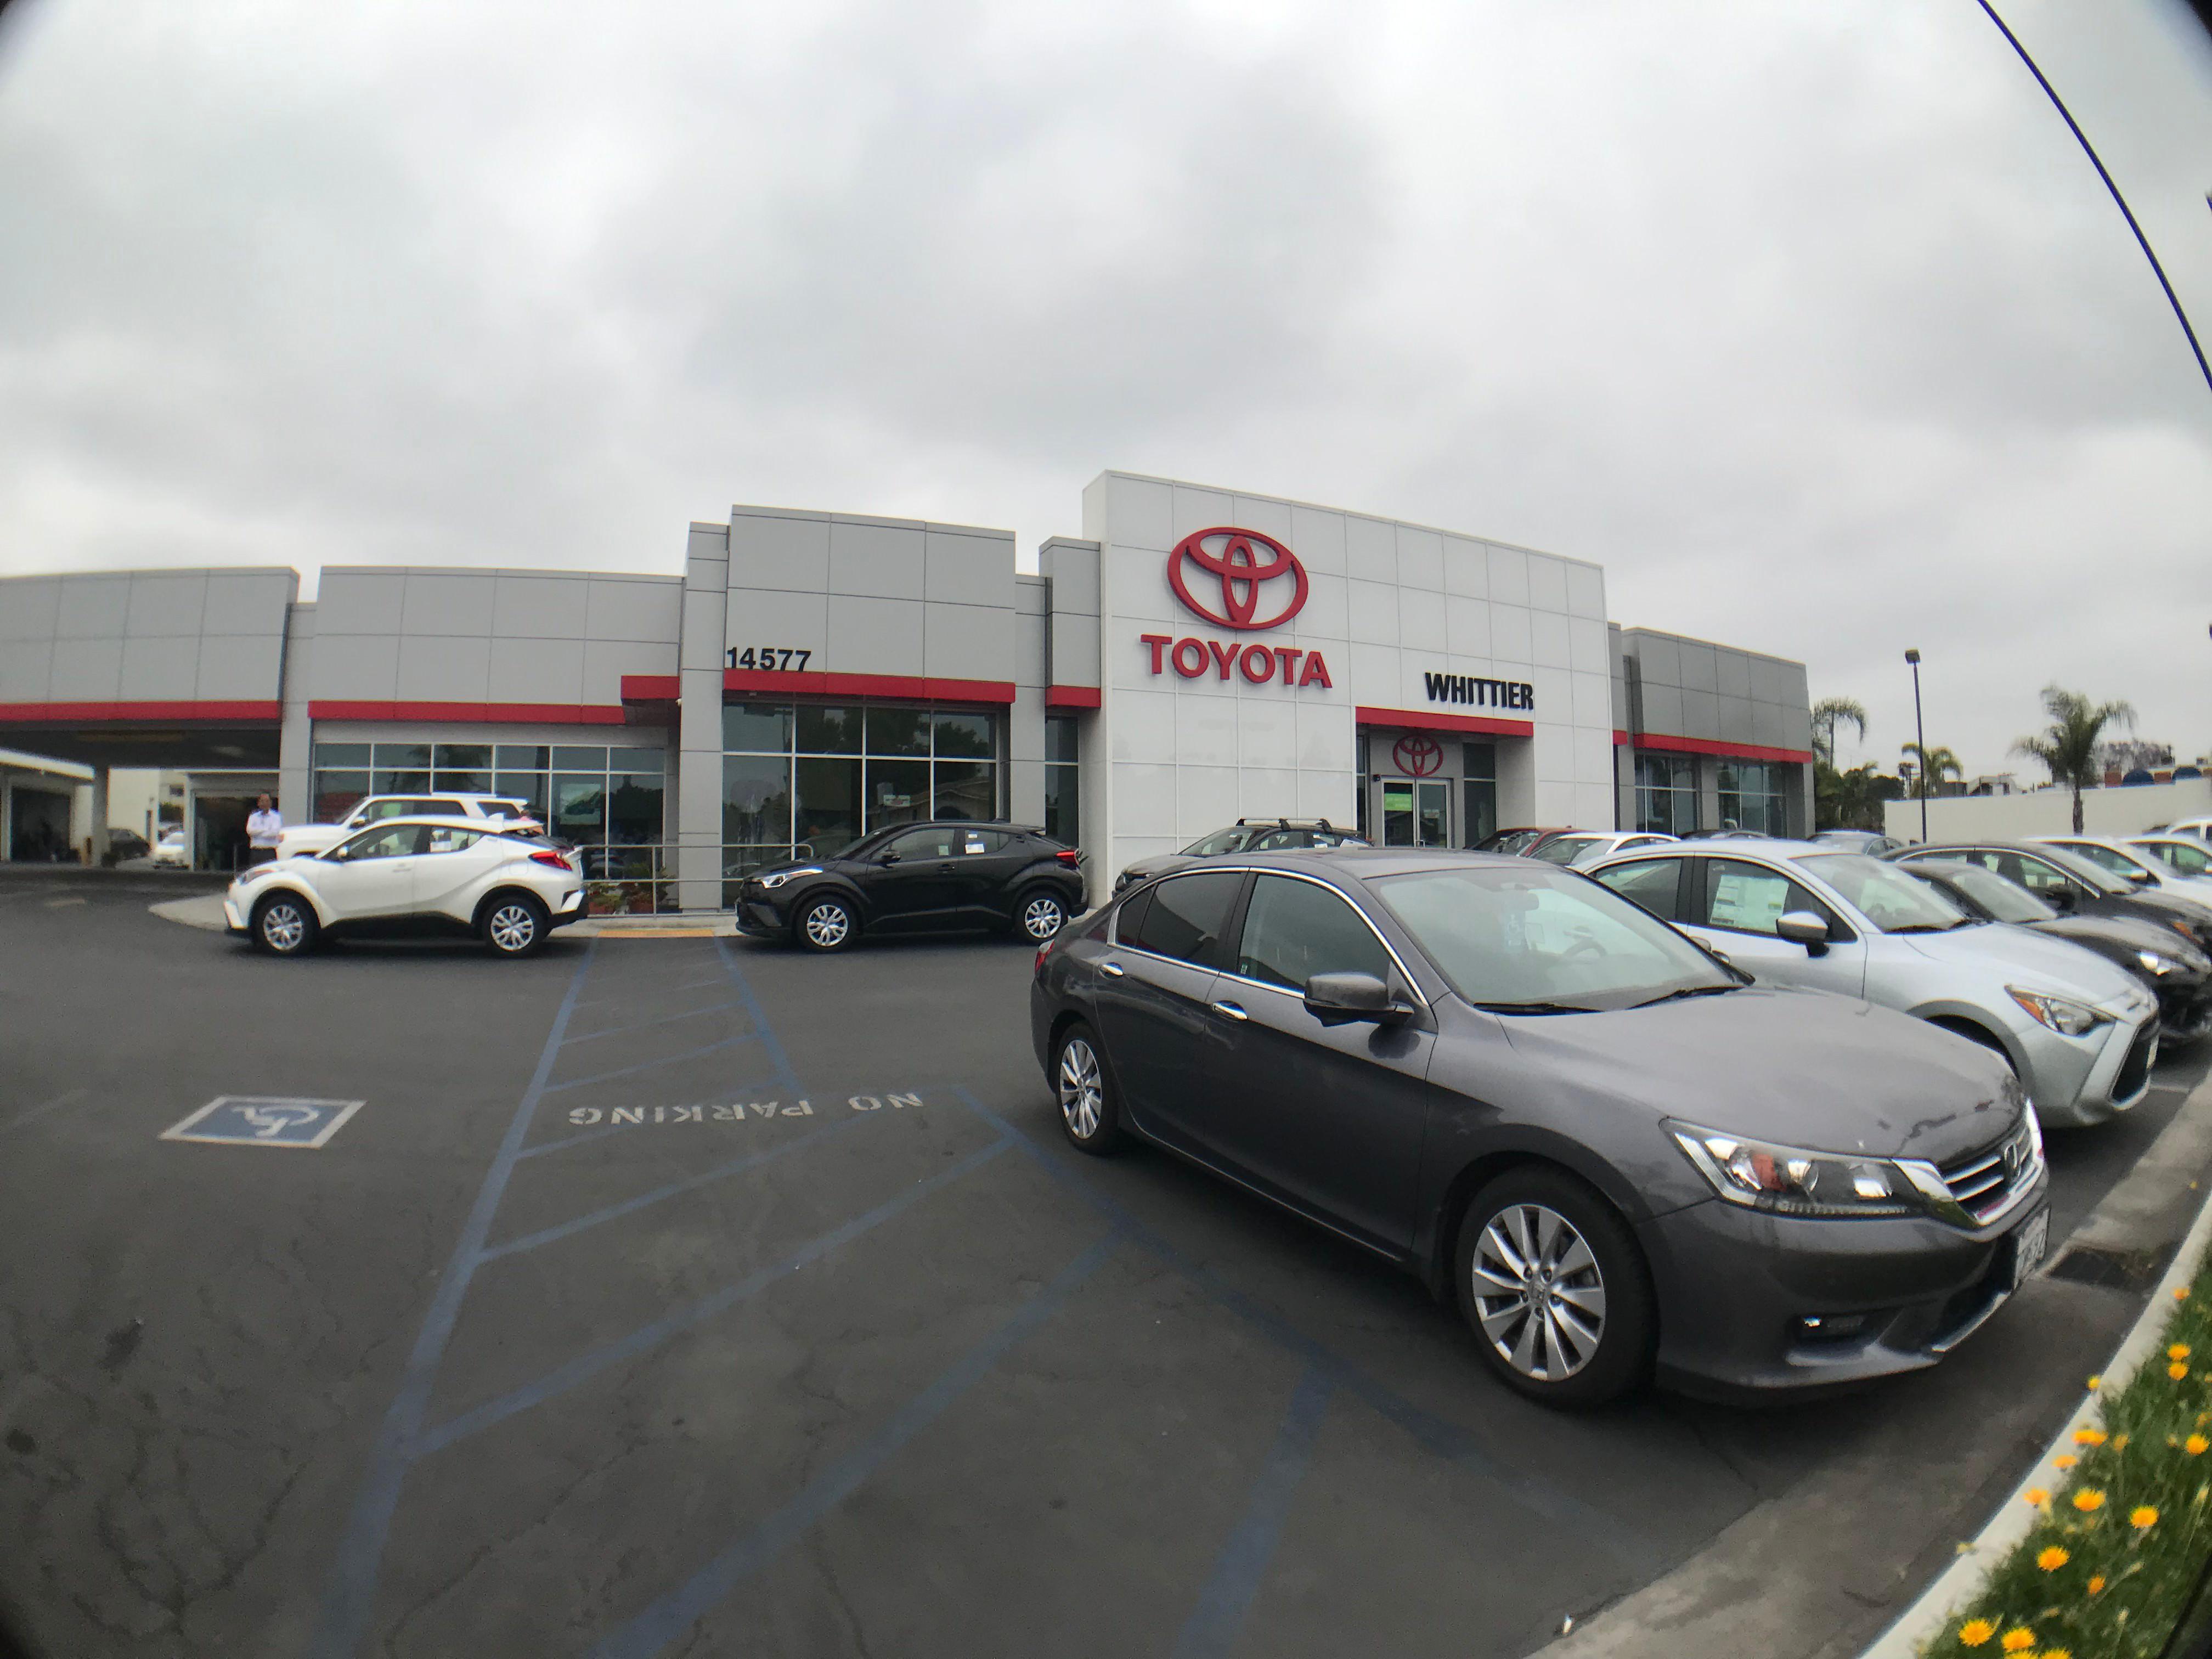 Toyota of Whittier image 0